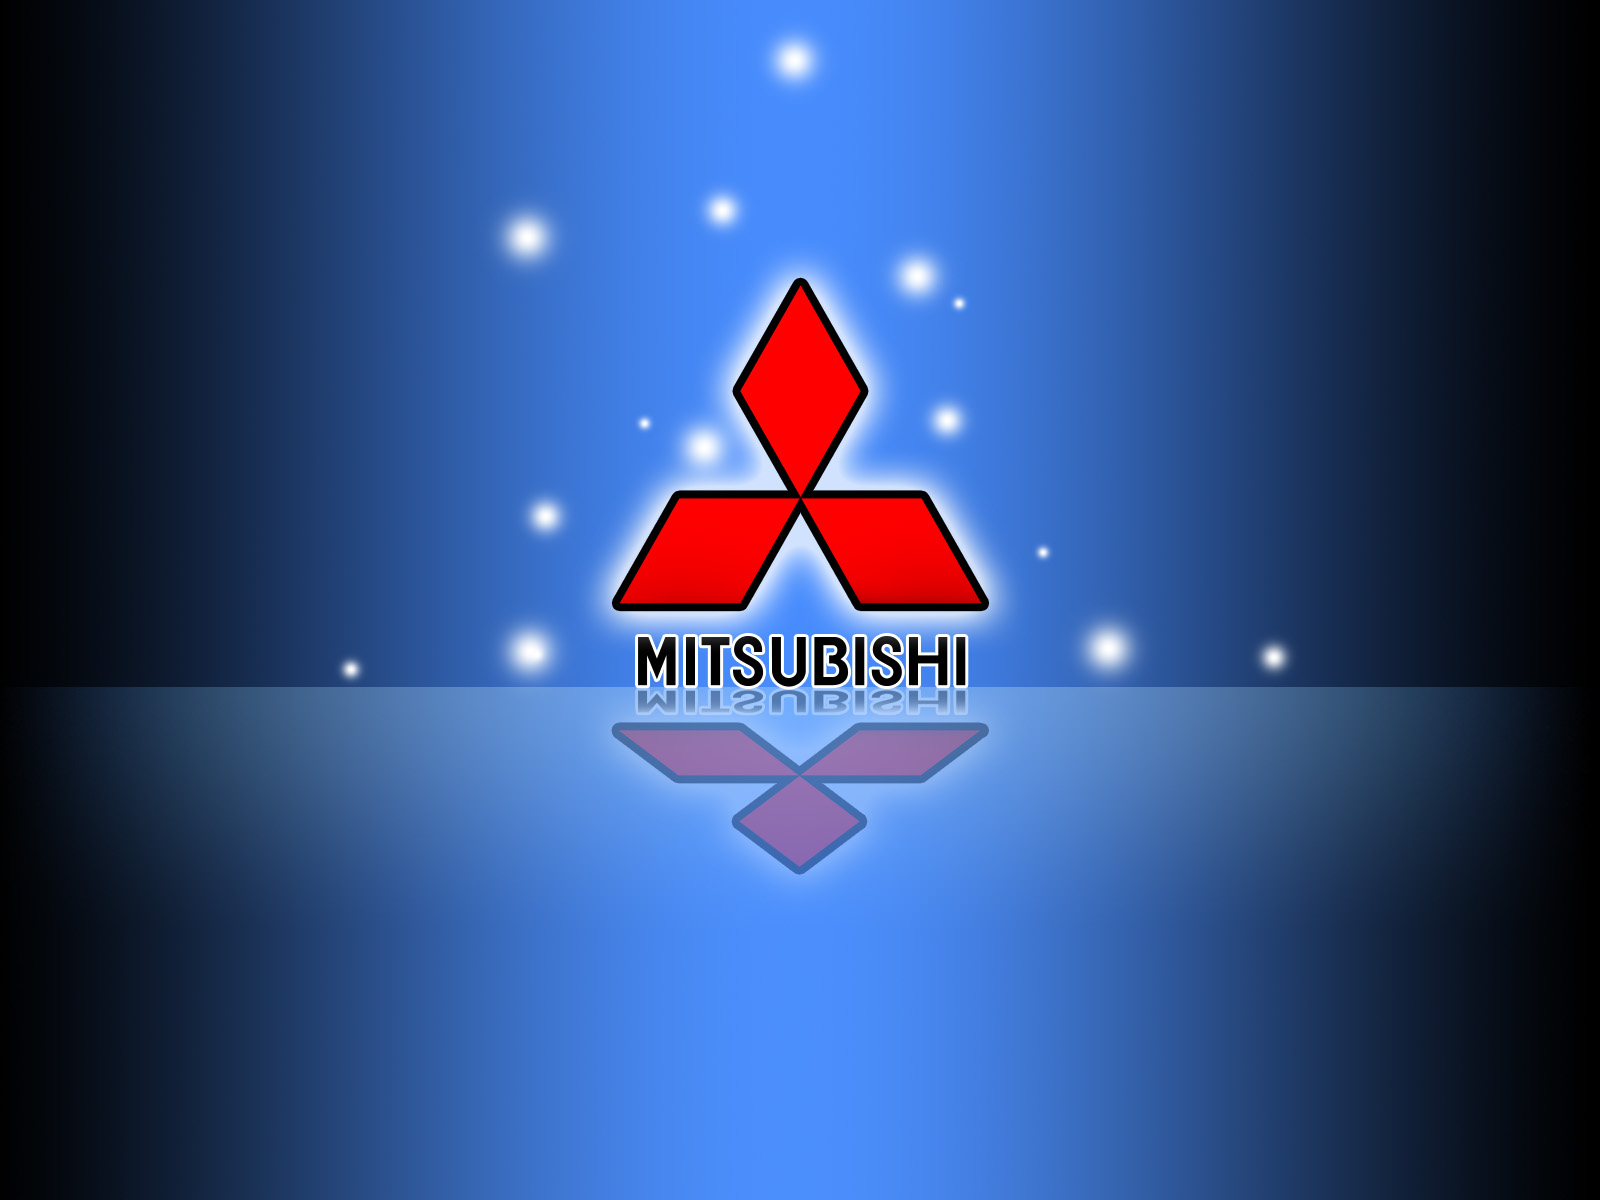 Image gallery for mitsubishi logo wallpaper 1600x1200